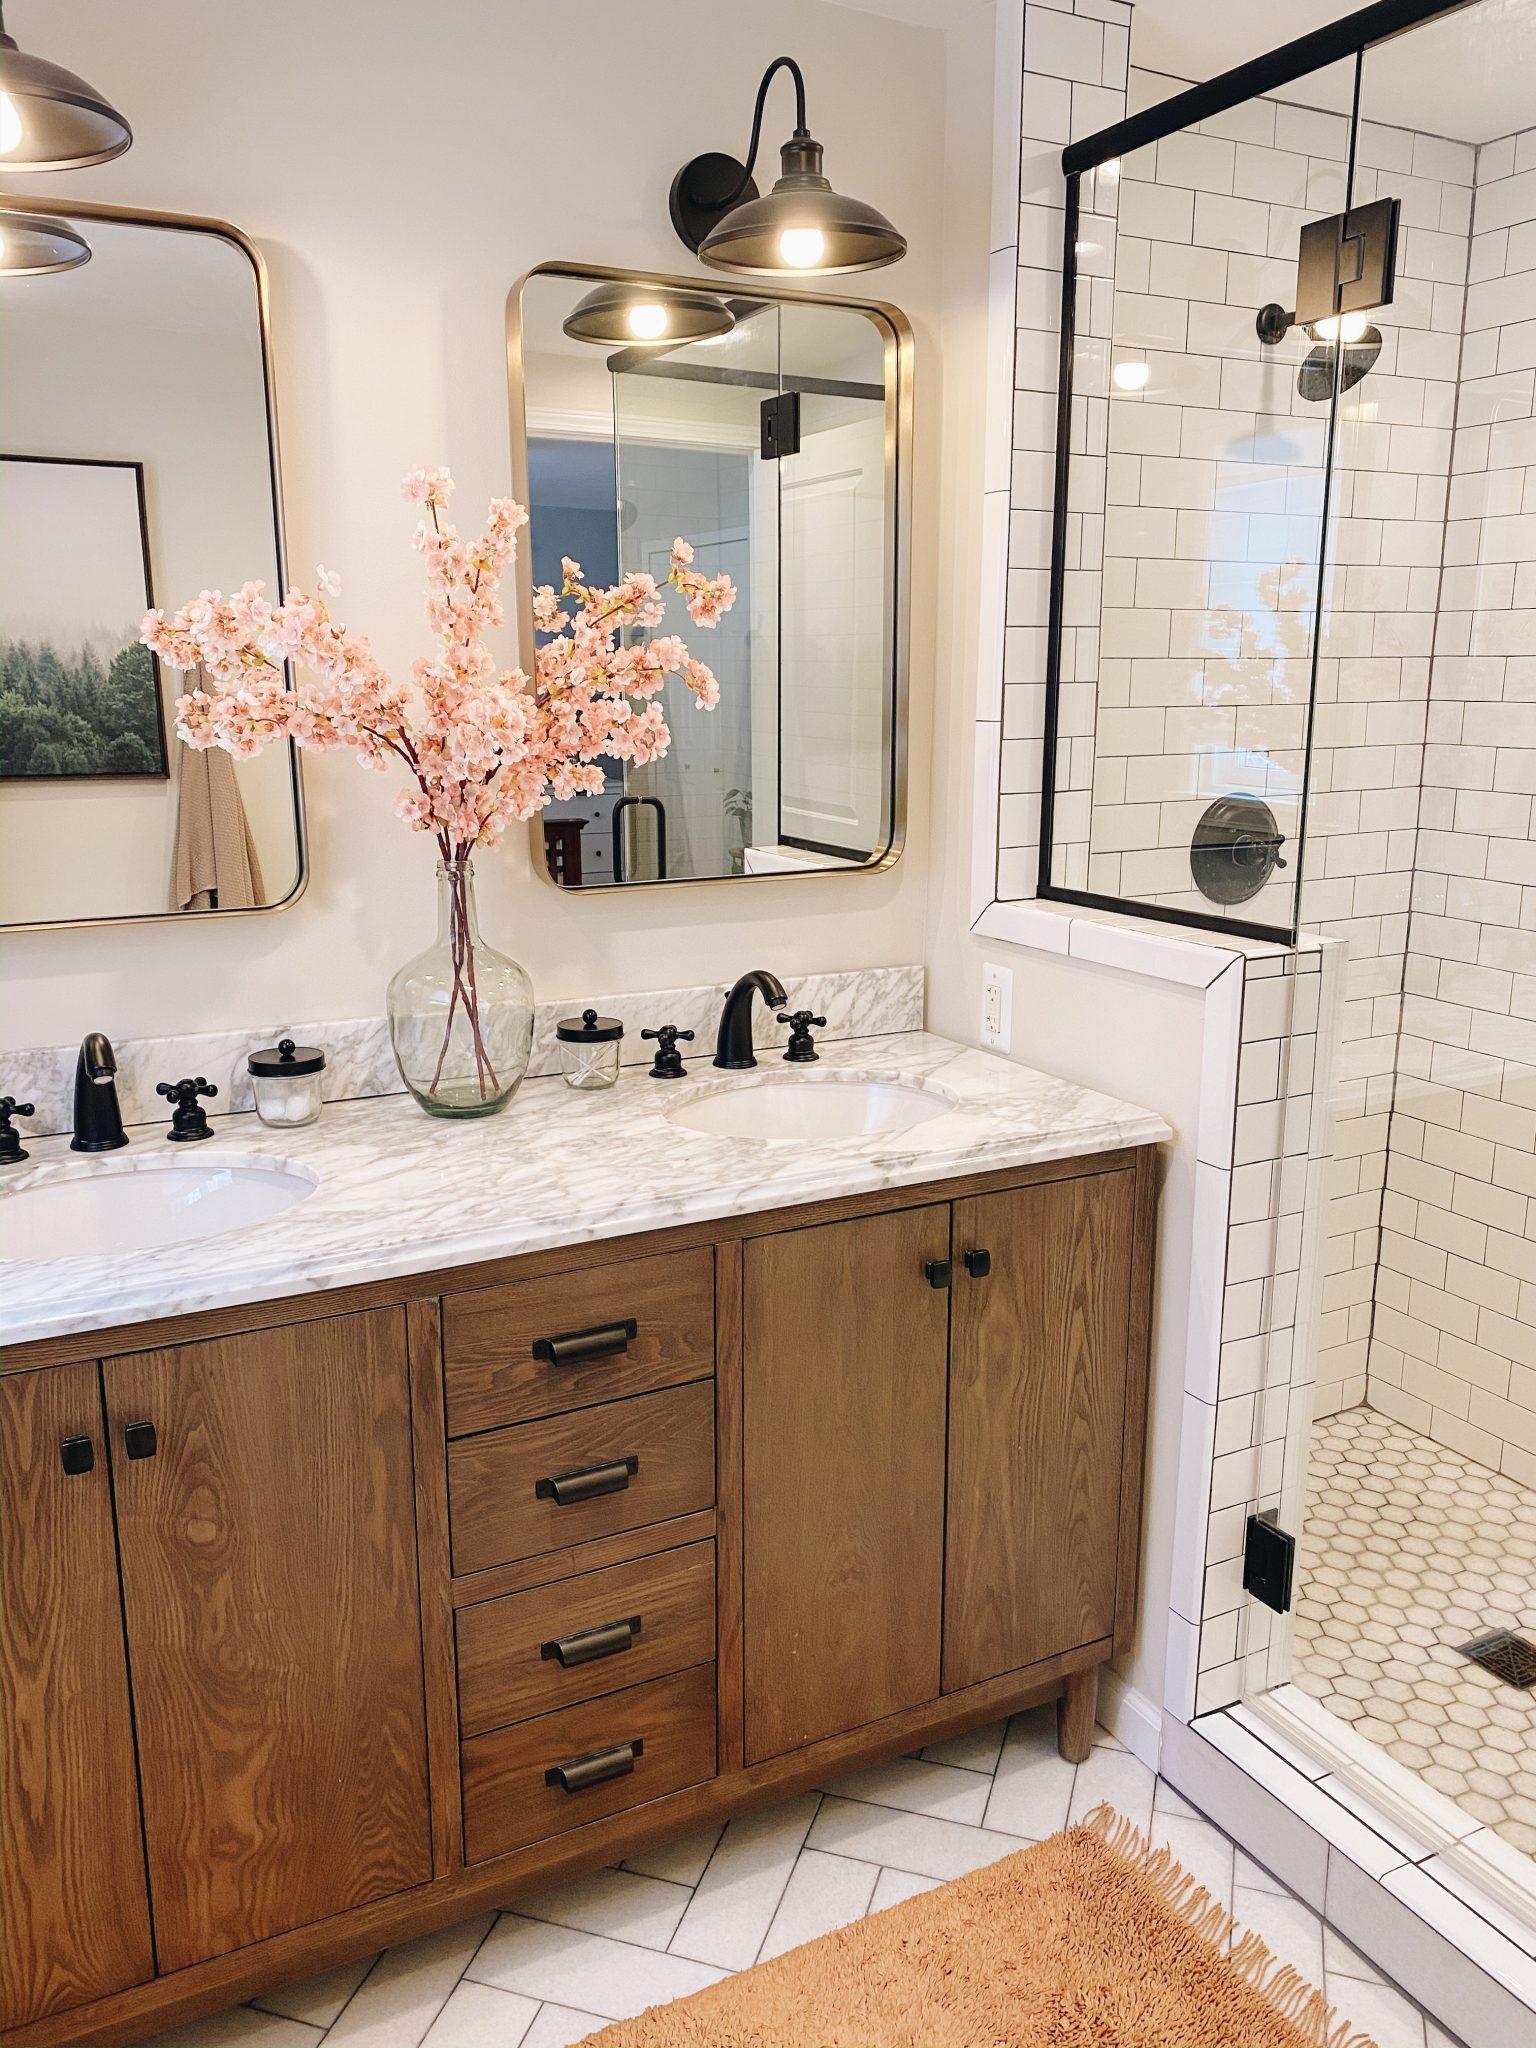 July Favorites | Daily Splendor Life and Style Blog | Master Bathroom #bathroommirrors #goldmirrors #farmhouselight #mastervanity #bathroomrenovation